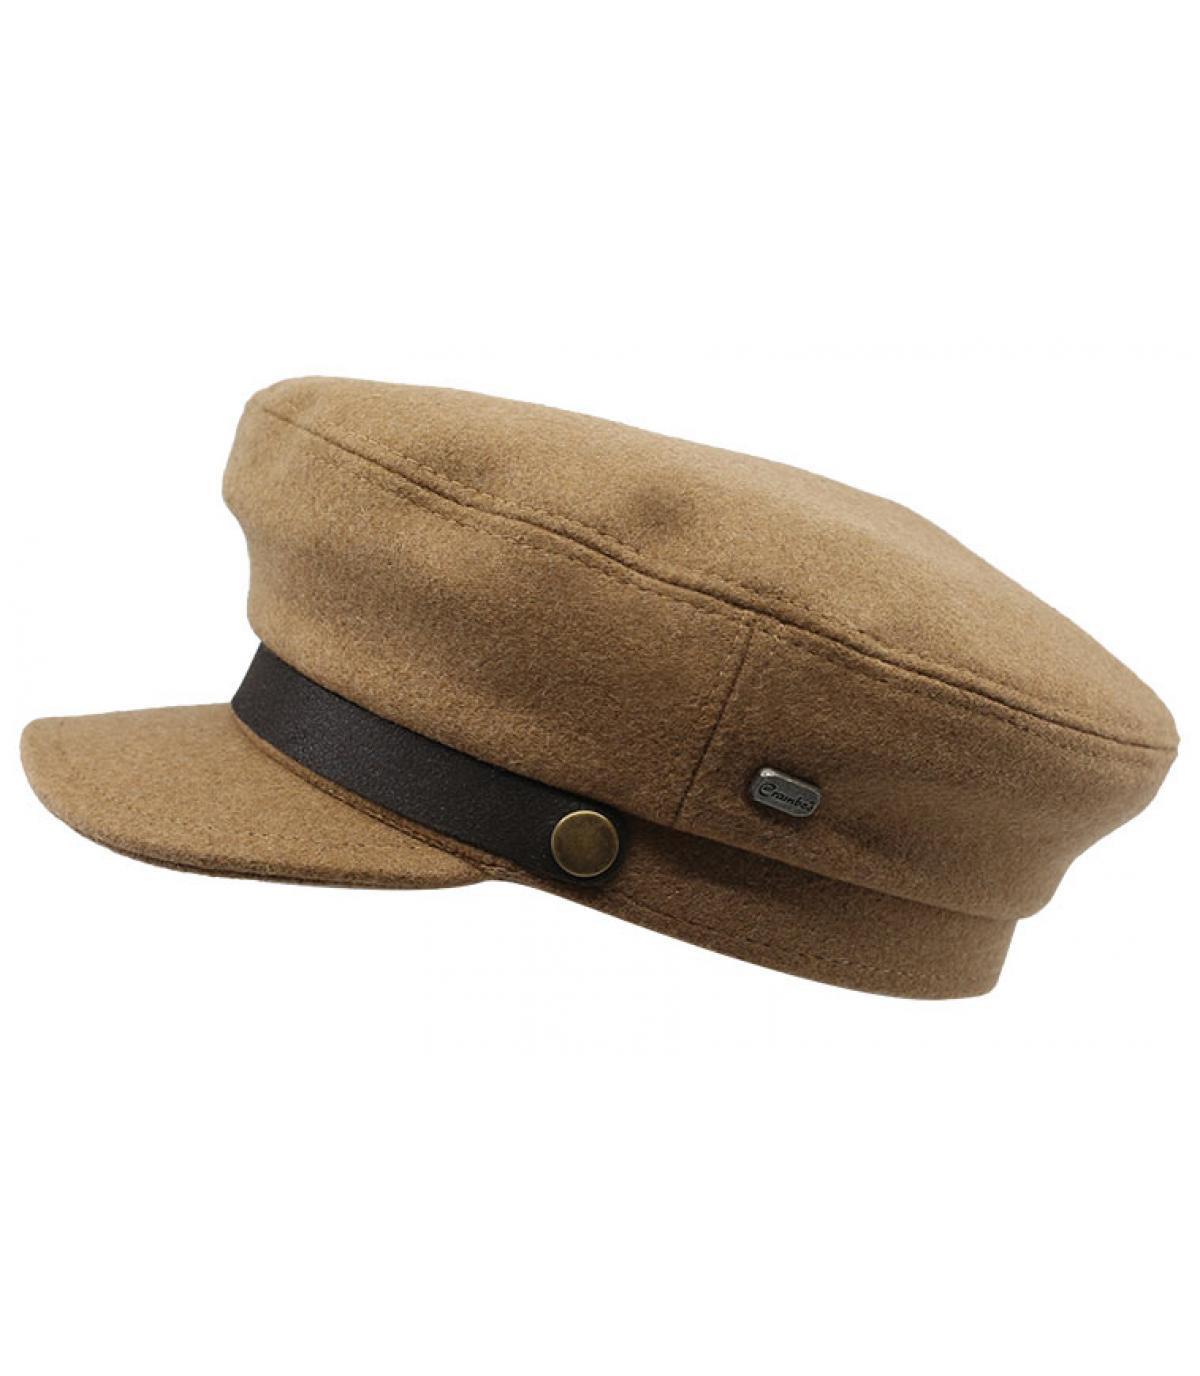 barato para descuento San Francisco ajuste clásico gorra marinera lana beis - Capitain Laine camel en su headwear ...